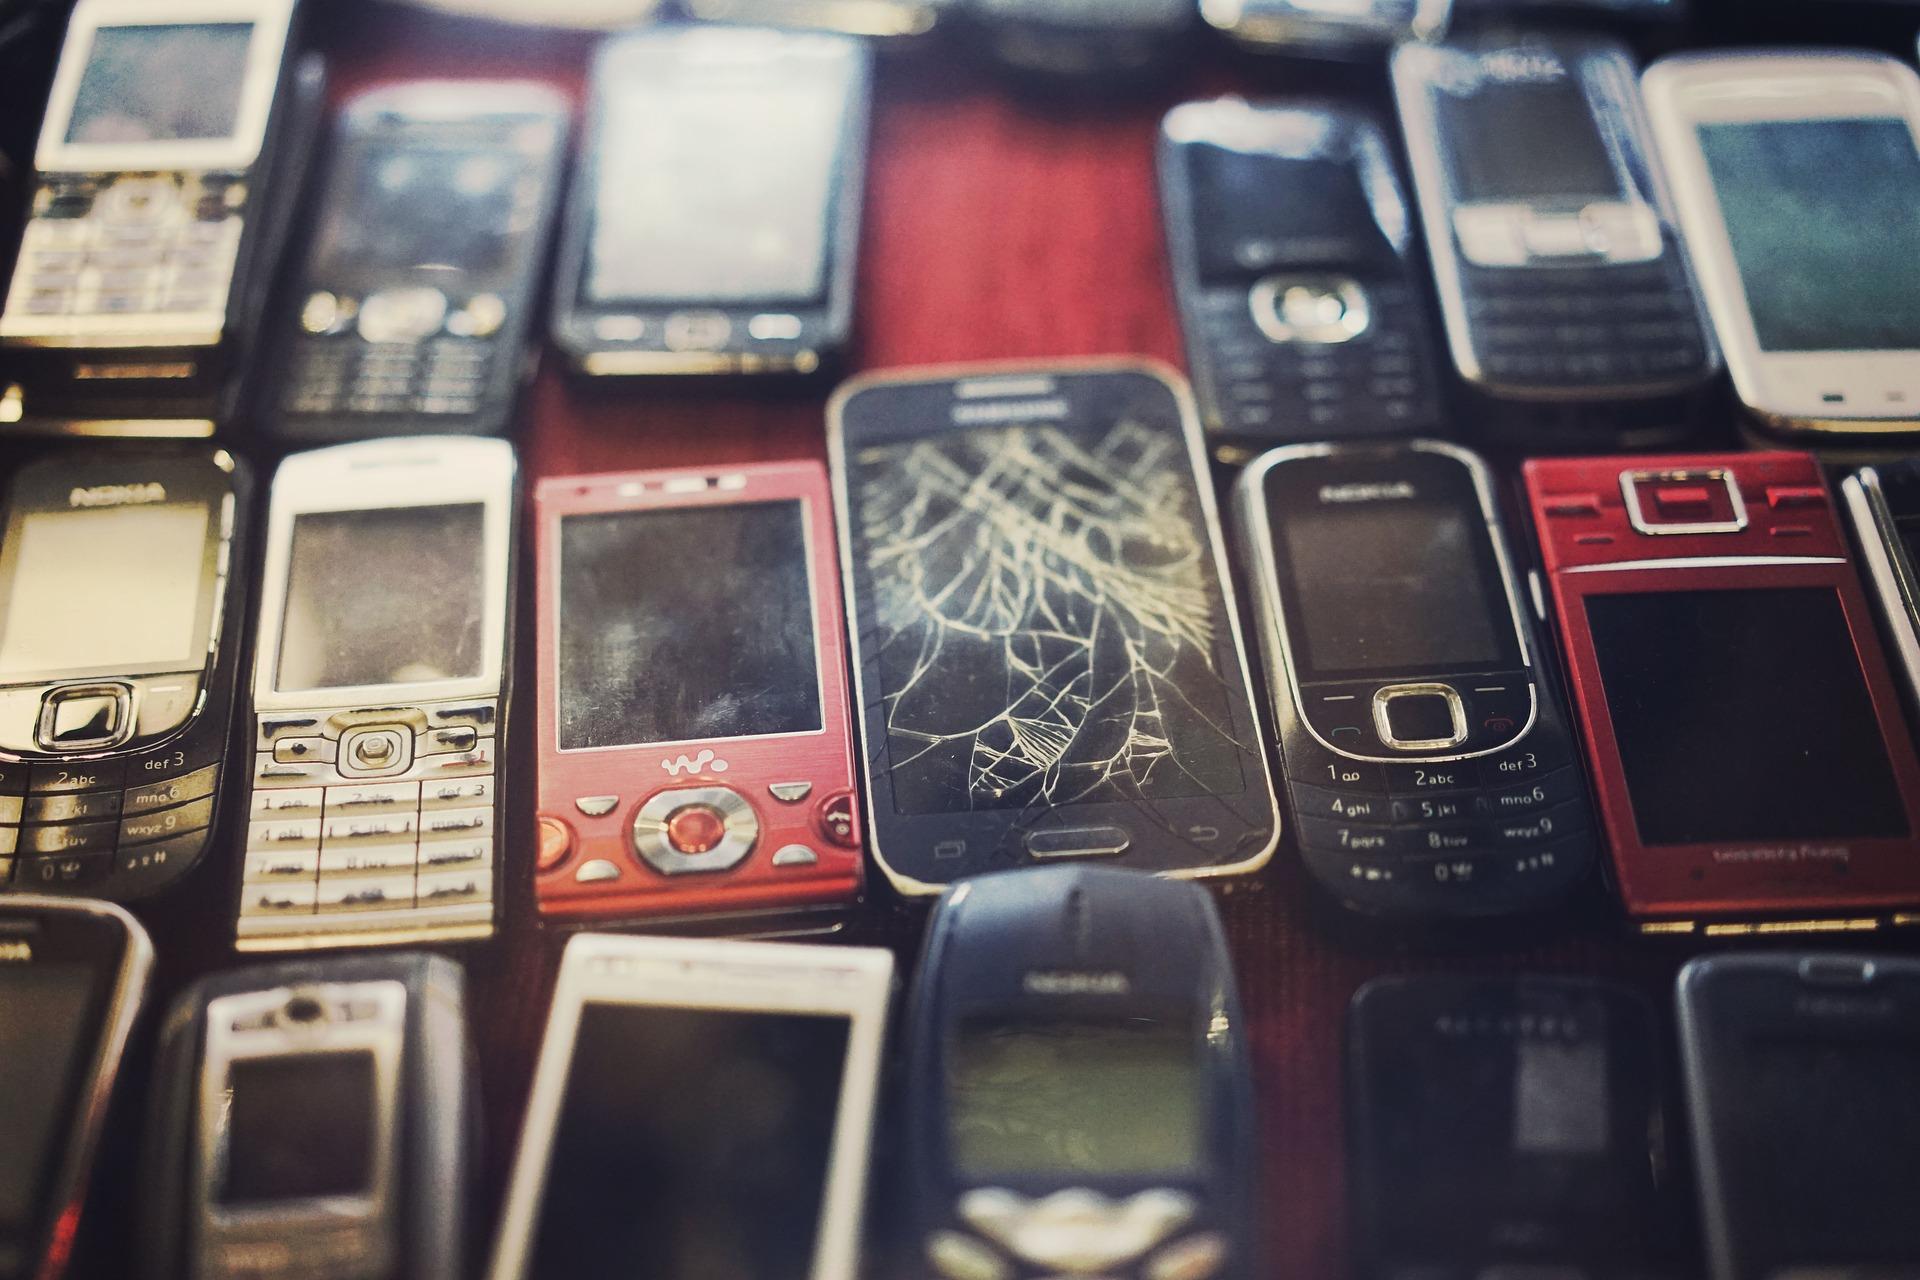 oprava-telefonov